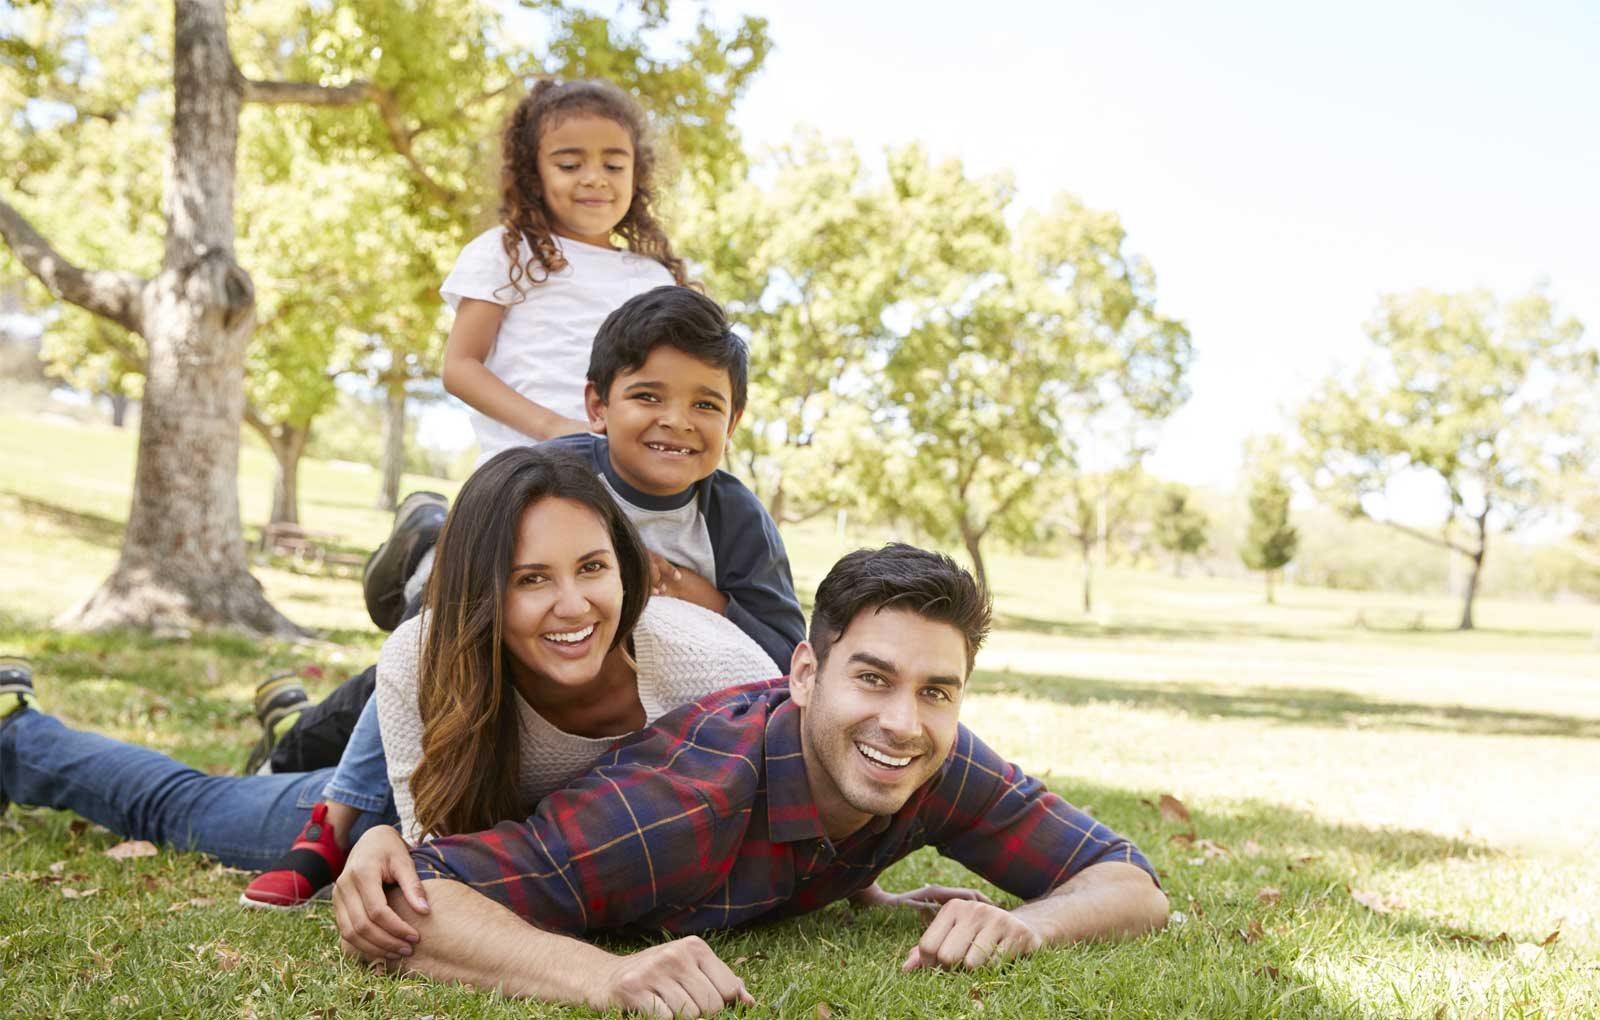 Family having fun outside